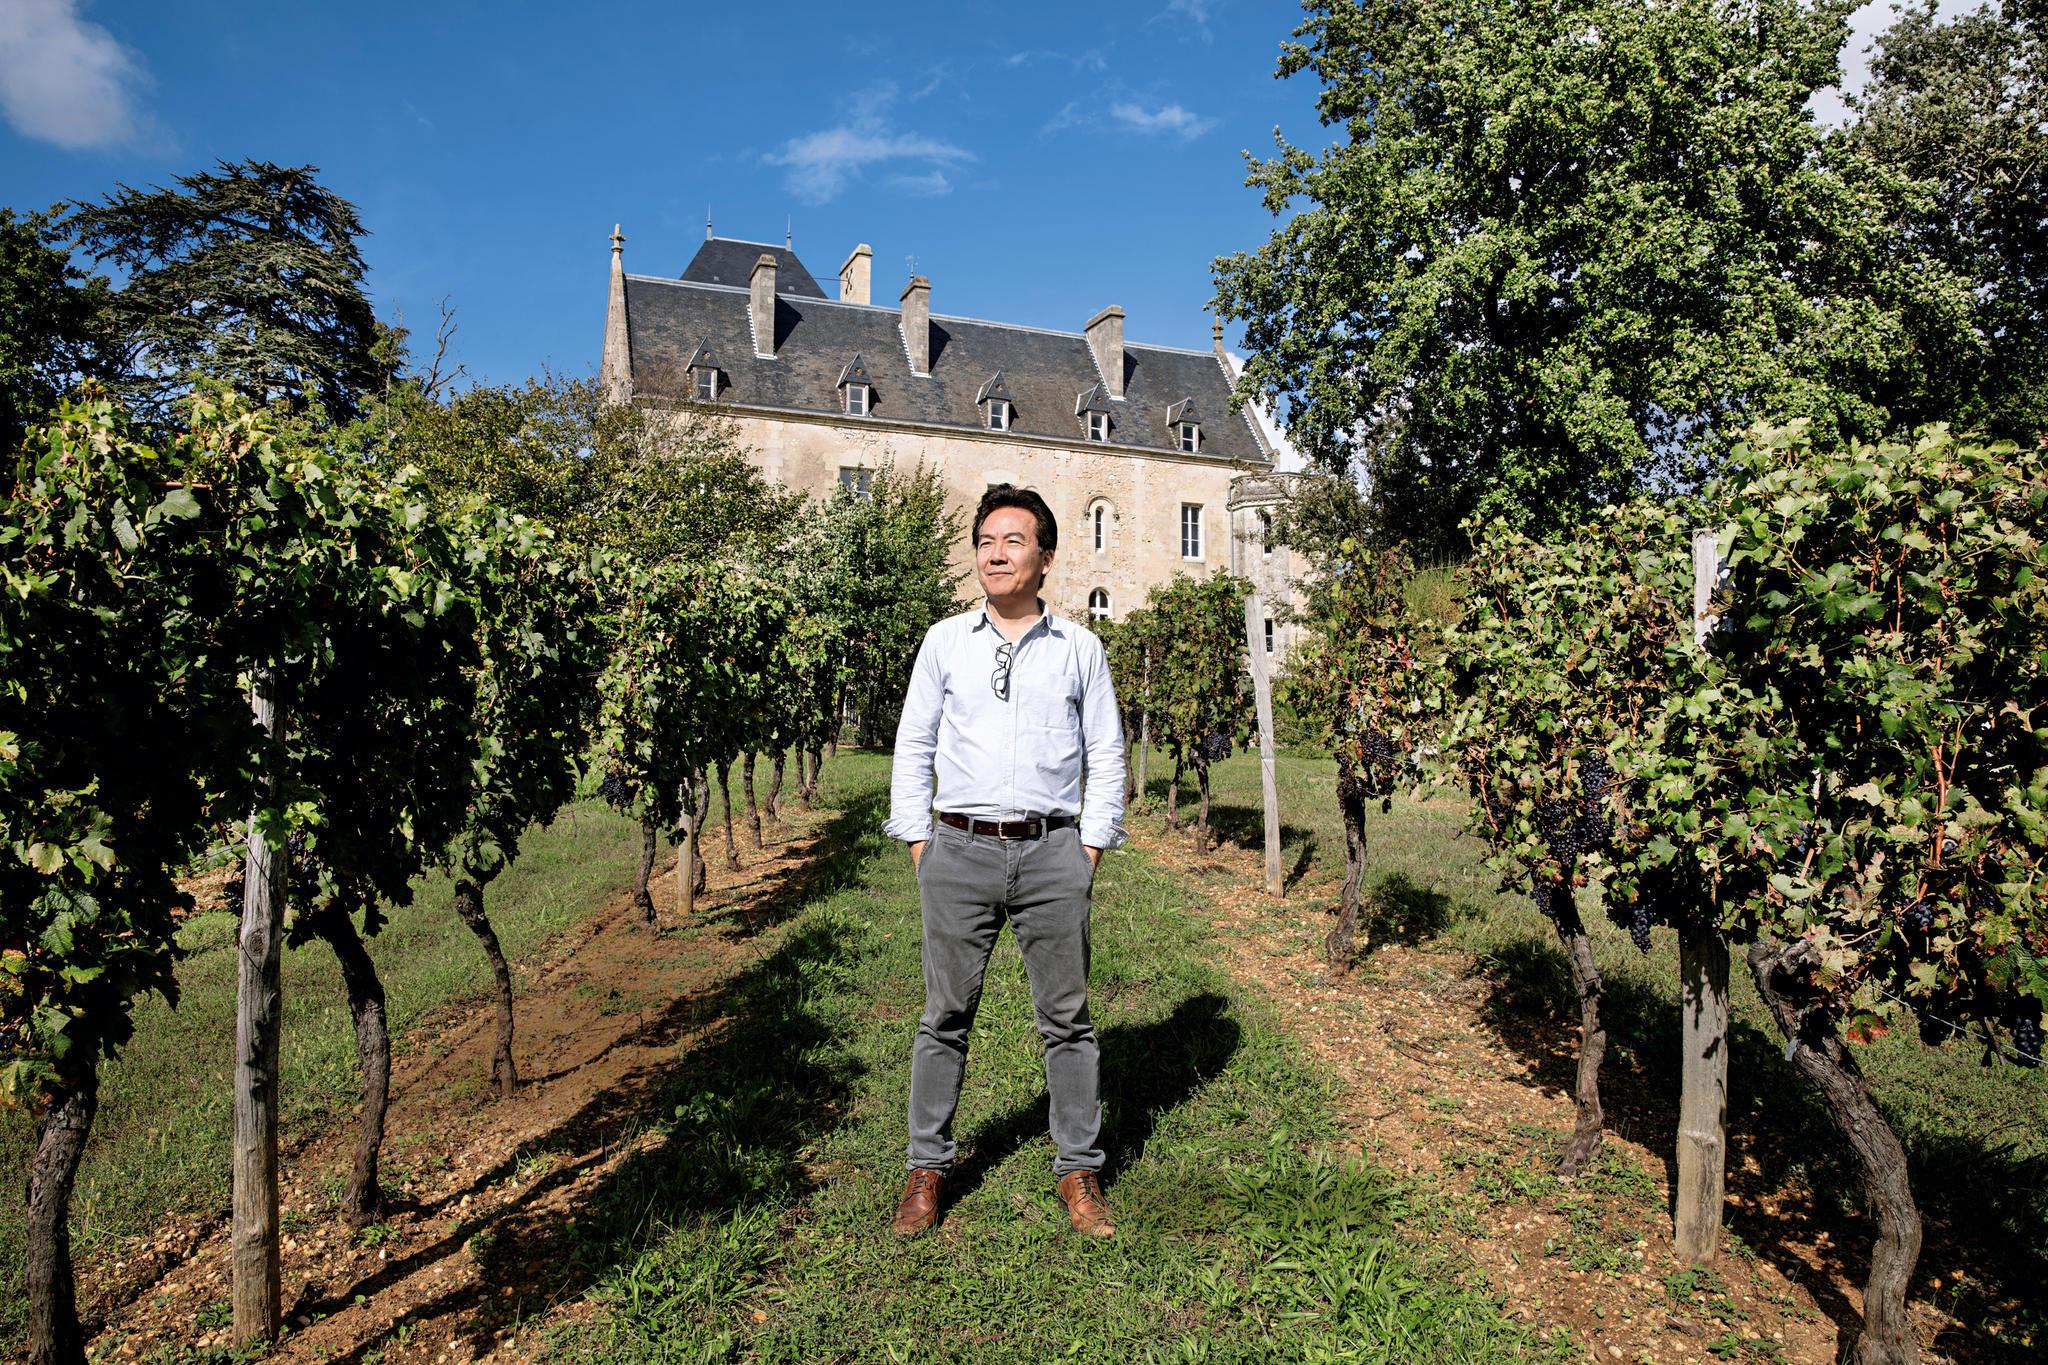 daafa7b39b Châteaux in Bordeaux: Chinesen kaufen weltberühmte Weingüter auf | STERN.de